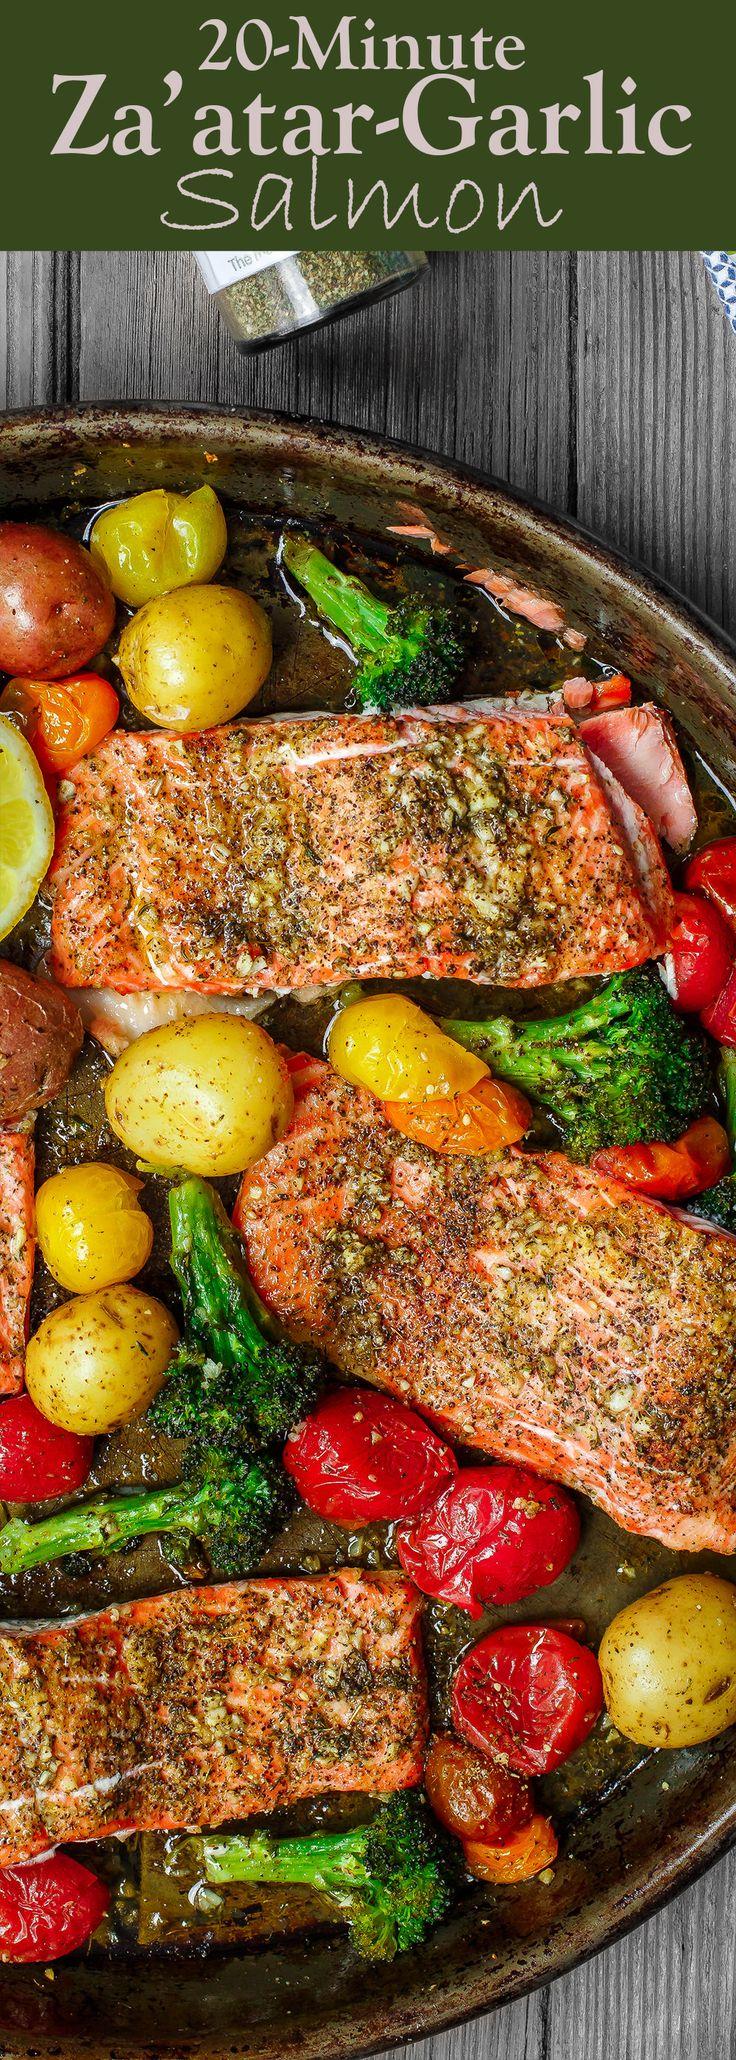 Za'atar Garlic Salmon Recipe | The Mediterranean Dish. Pan sheet garlic salmon with a Mediterranean twist you will love! Crusty zaatar, lemon juice, olive oil and veggies all on one sheet. Ready in 25 minutes! See the recipe on TheMediterraneanDish.com